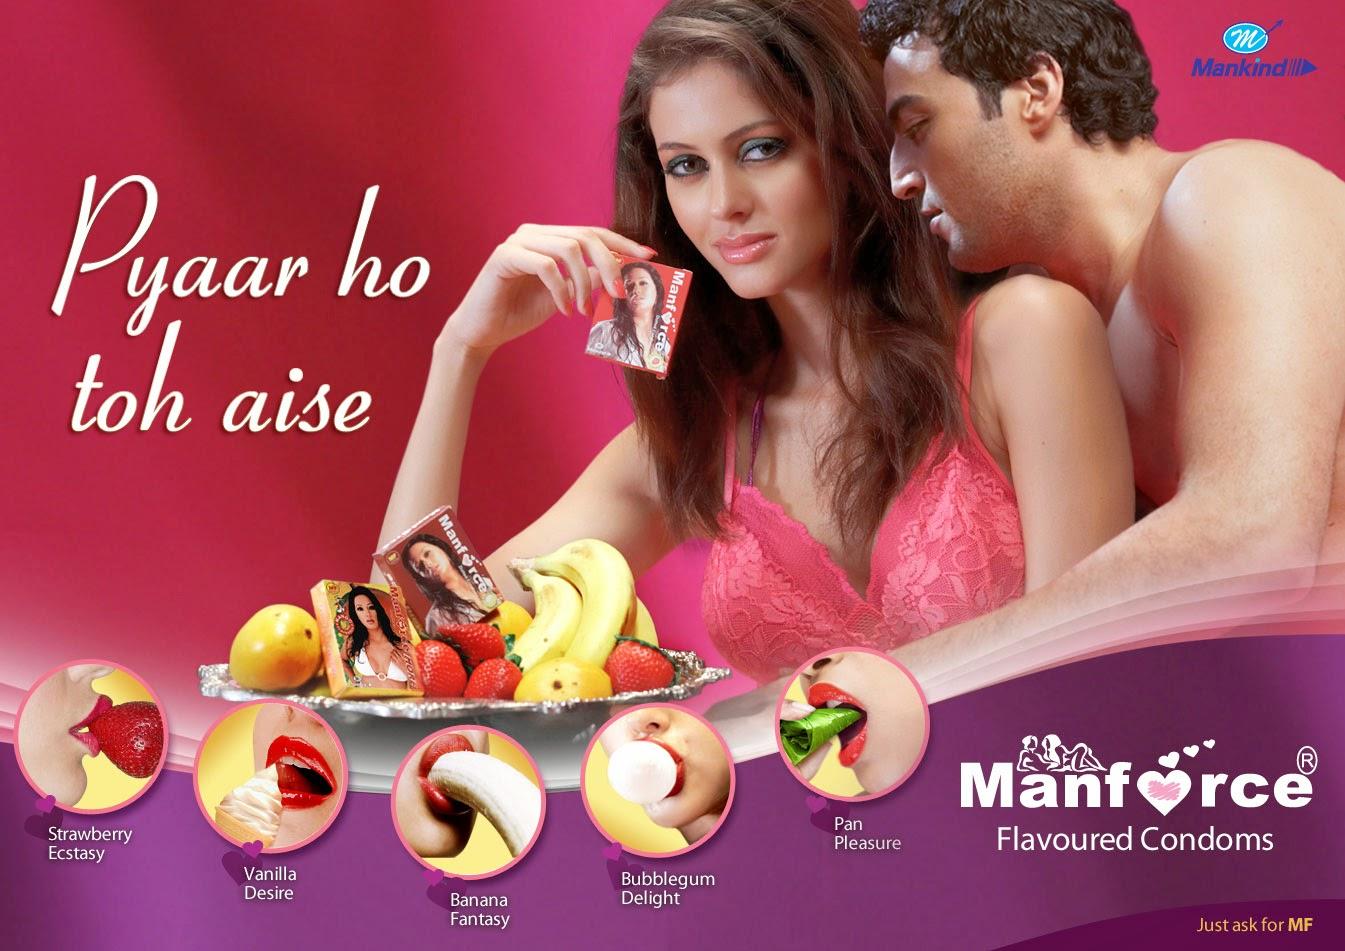 Manforce female condom